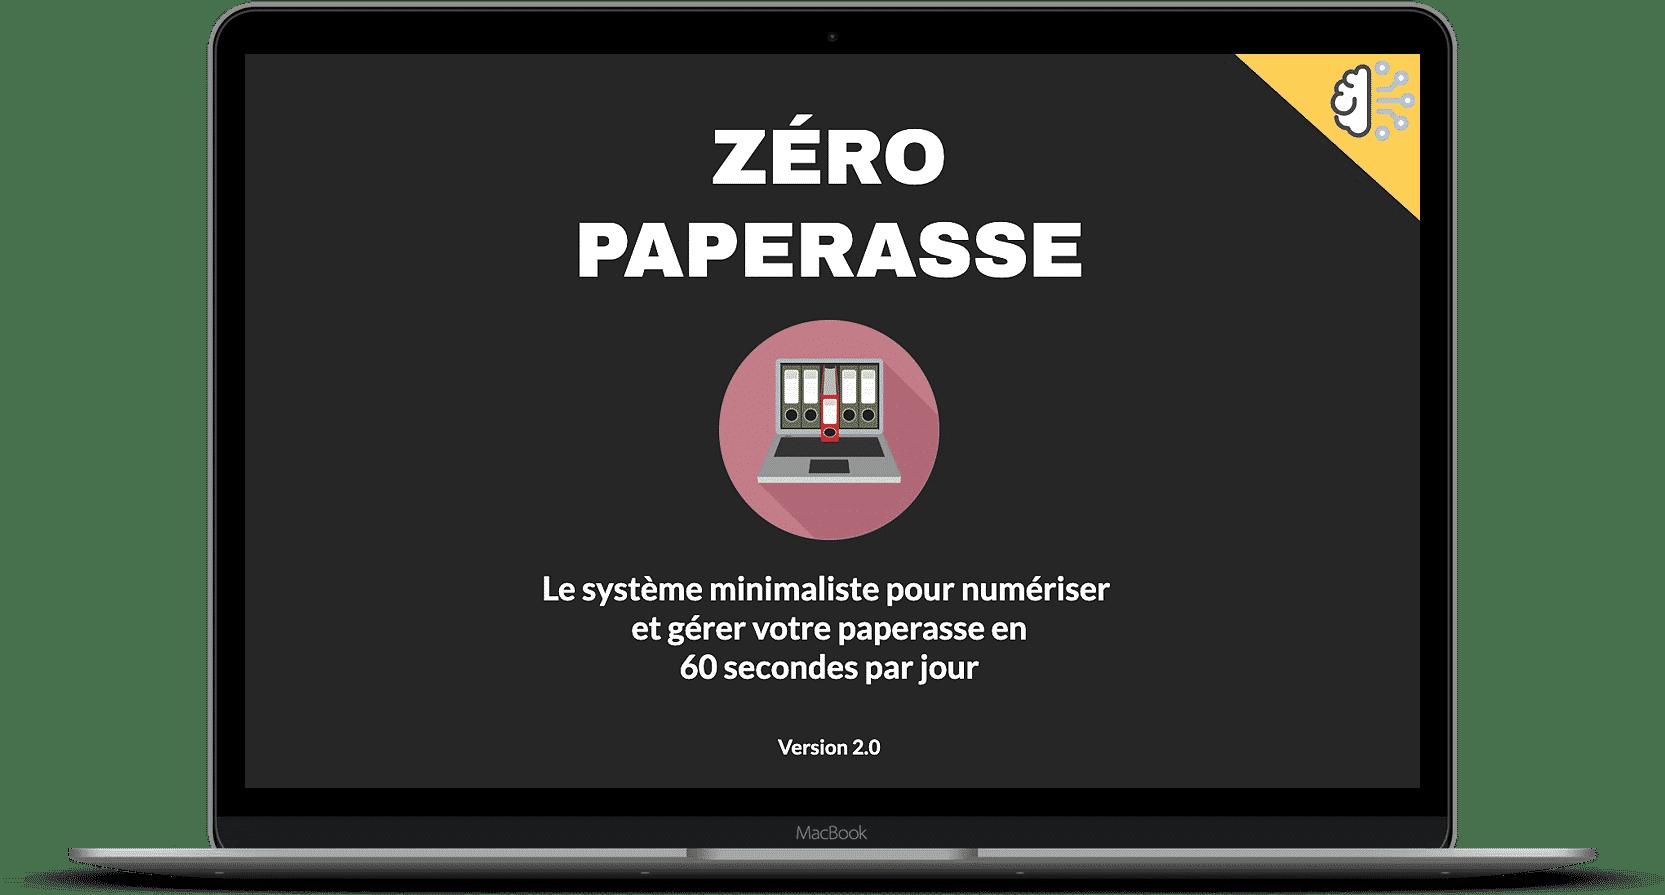 zéro paperasse 2.0